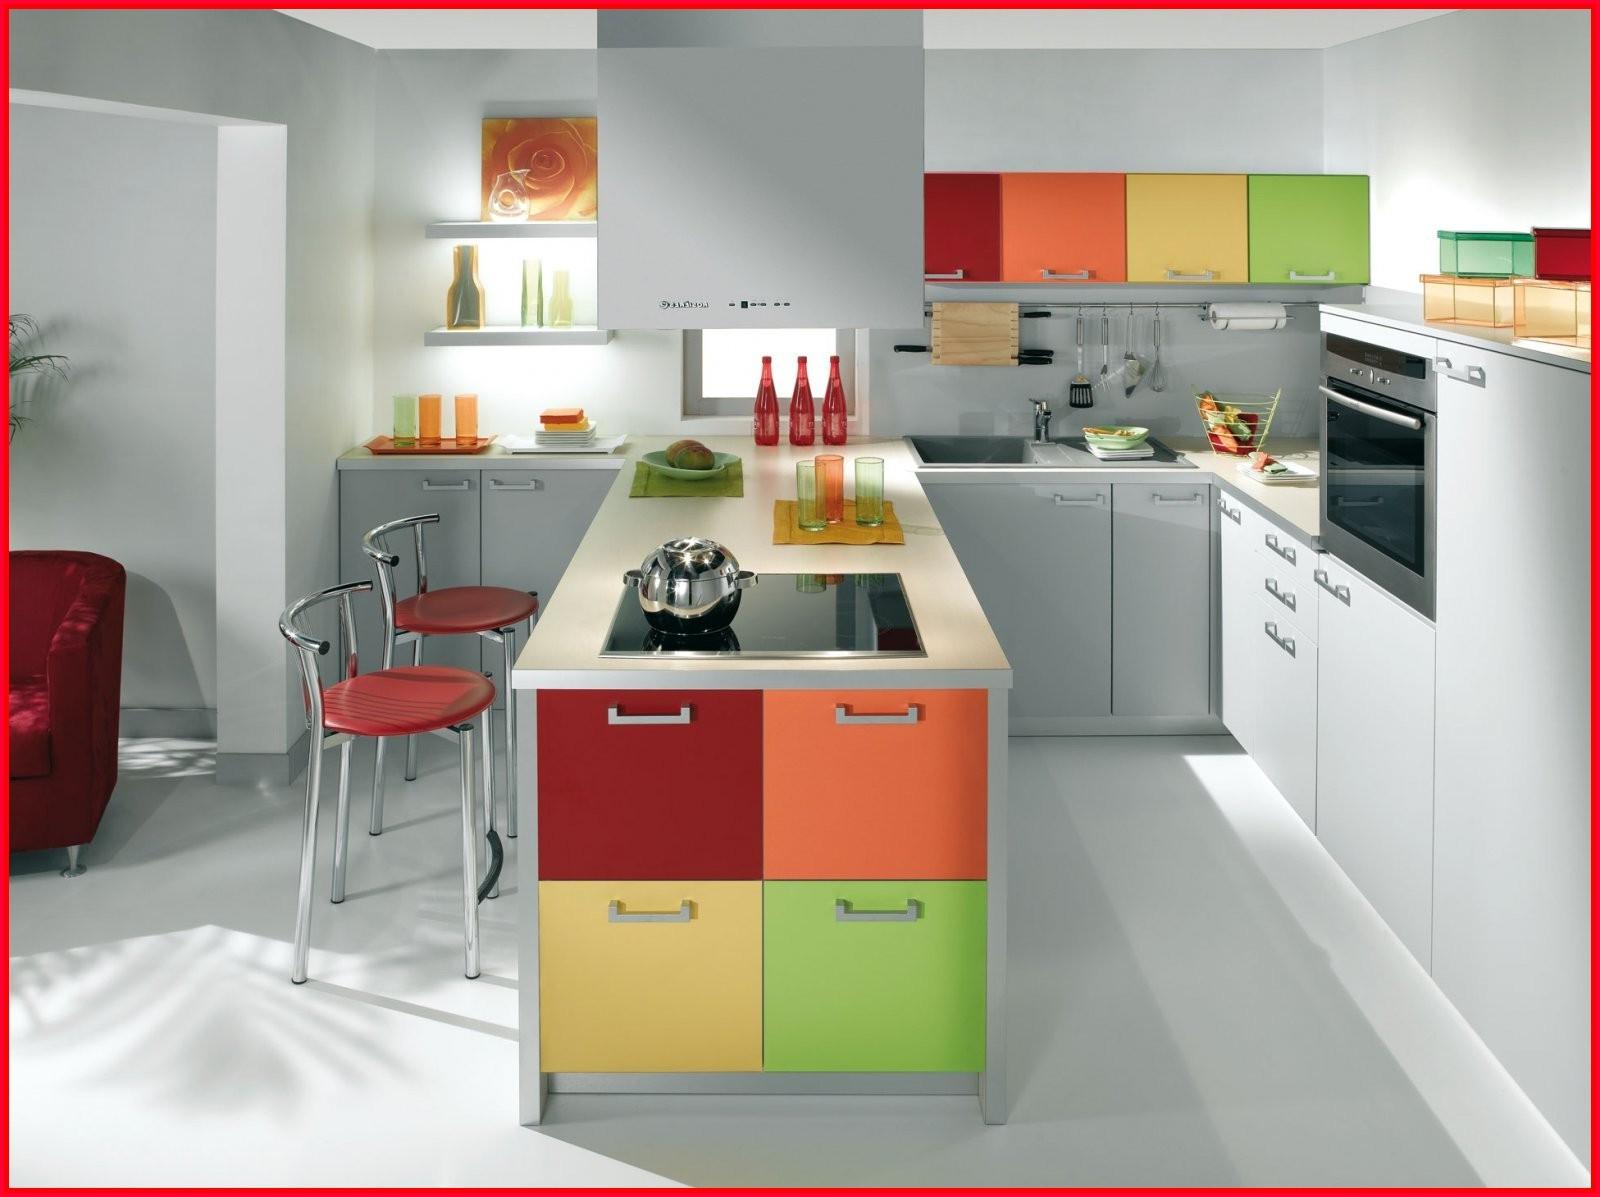 Programa Diseño Muebles 3d Gratis Jxdu Diseà O Cocina 3d DiseO De Cocinas Gratis Best DiseO De